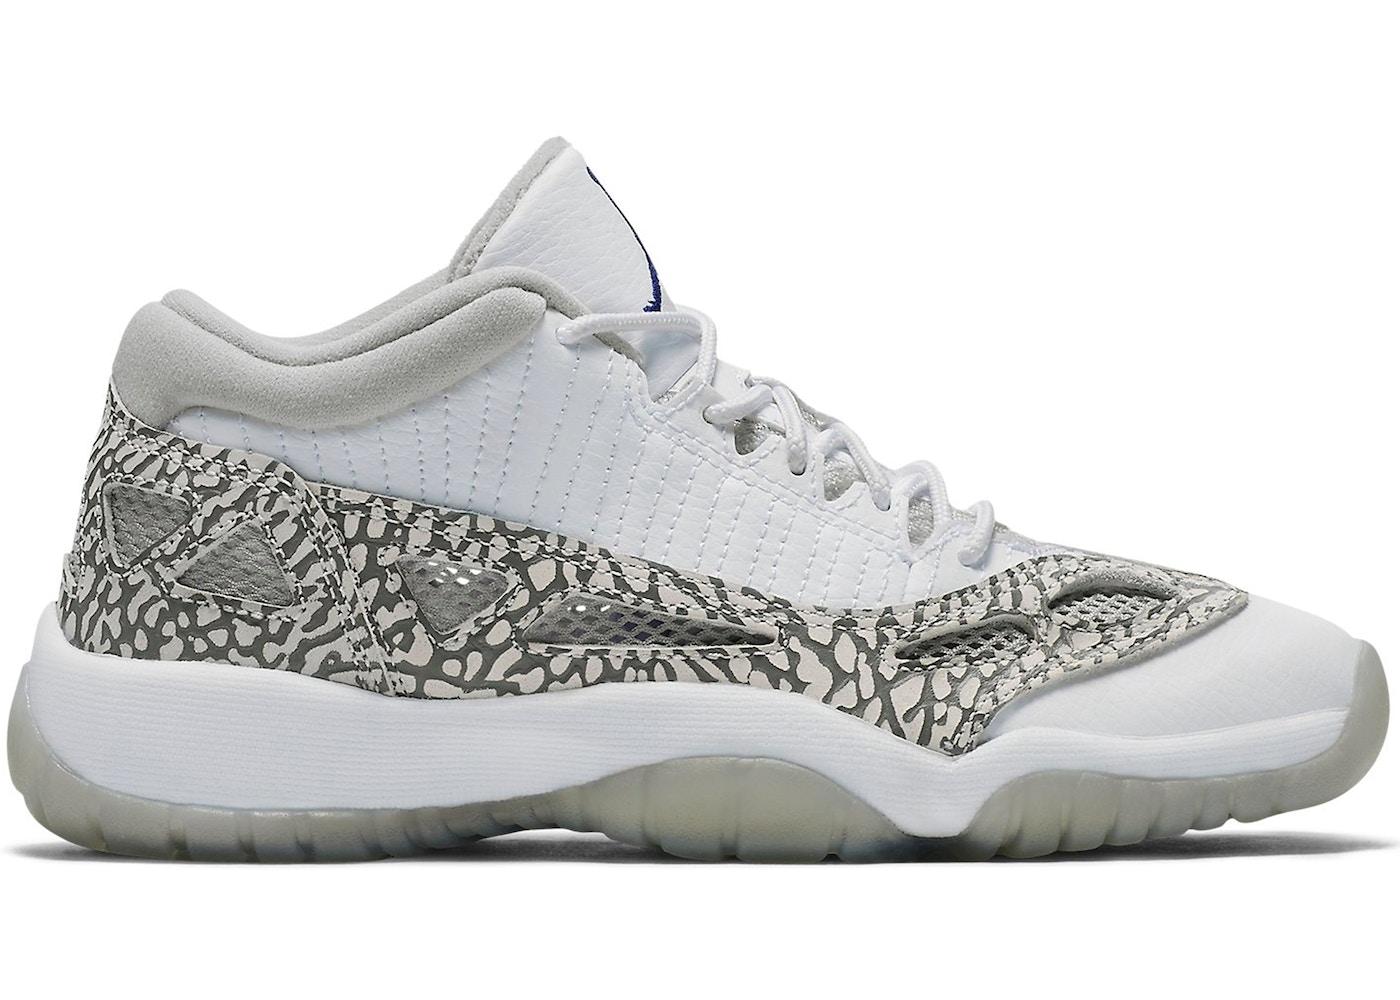 11 Ie Low Cobalt Jordan Retro 2015gs IYEbeWDH92